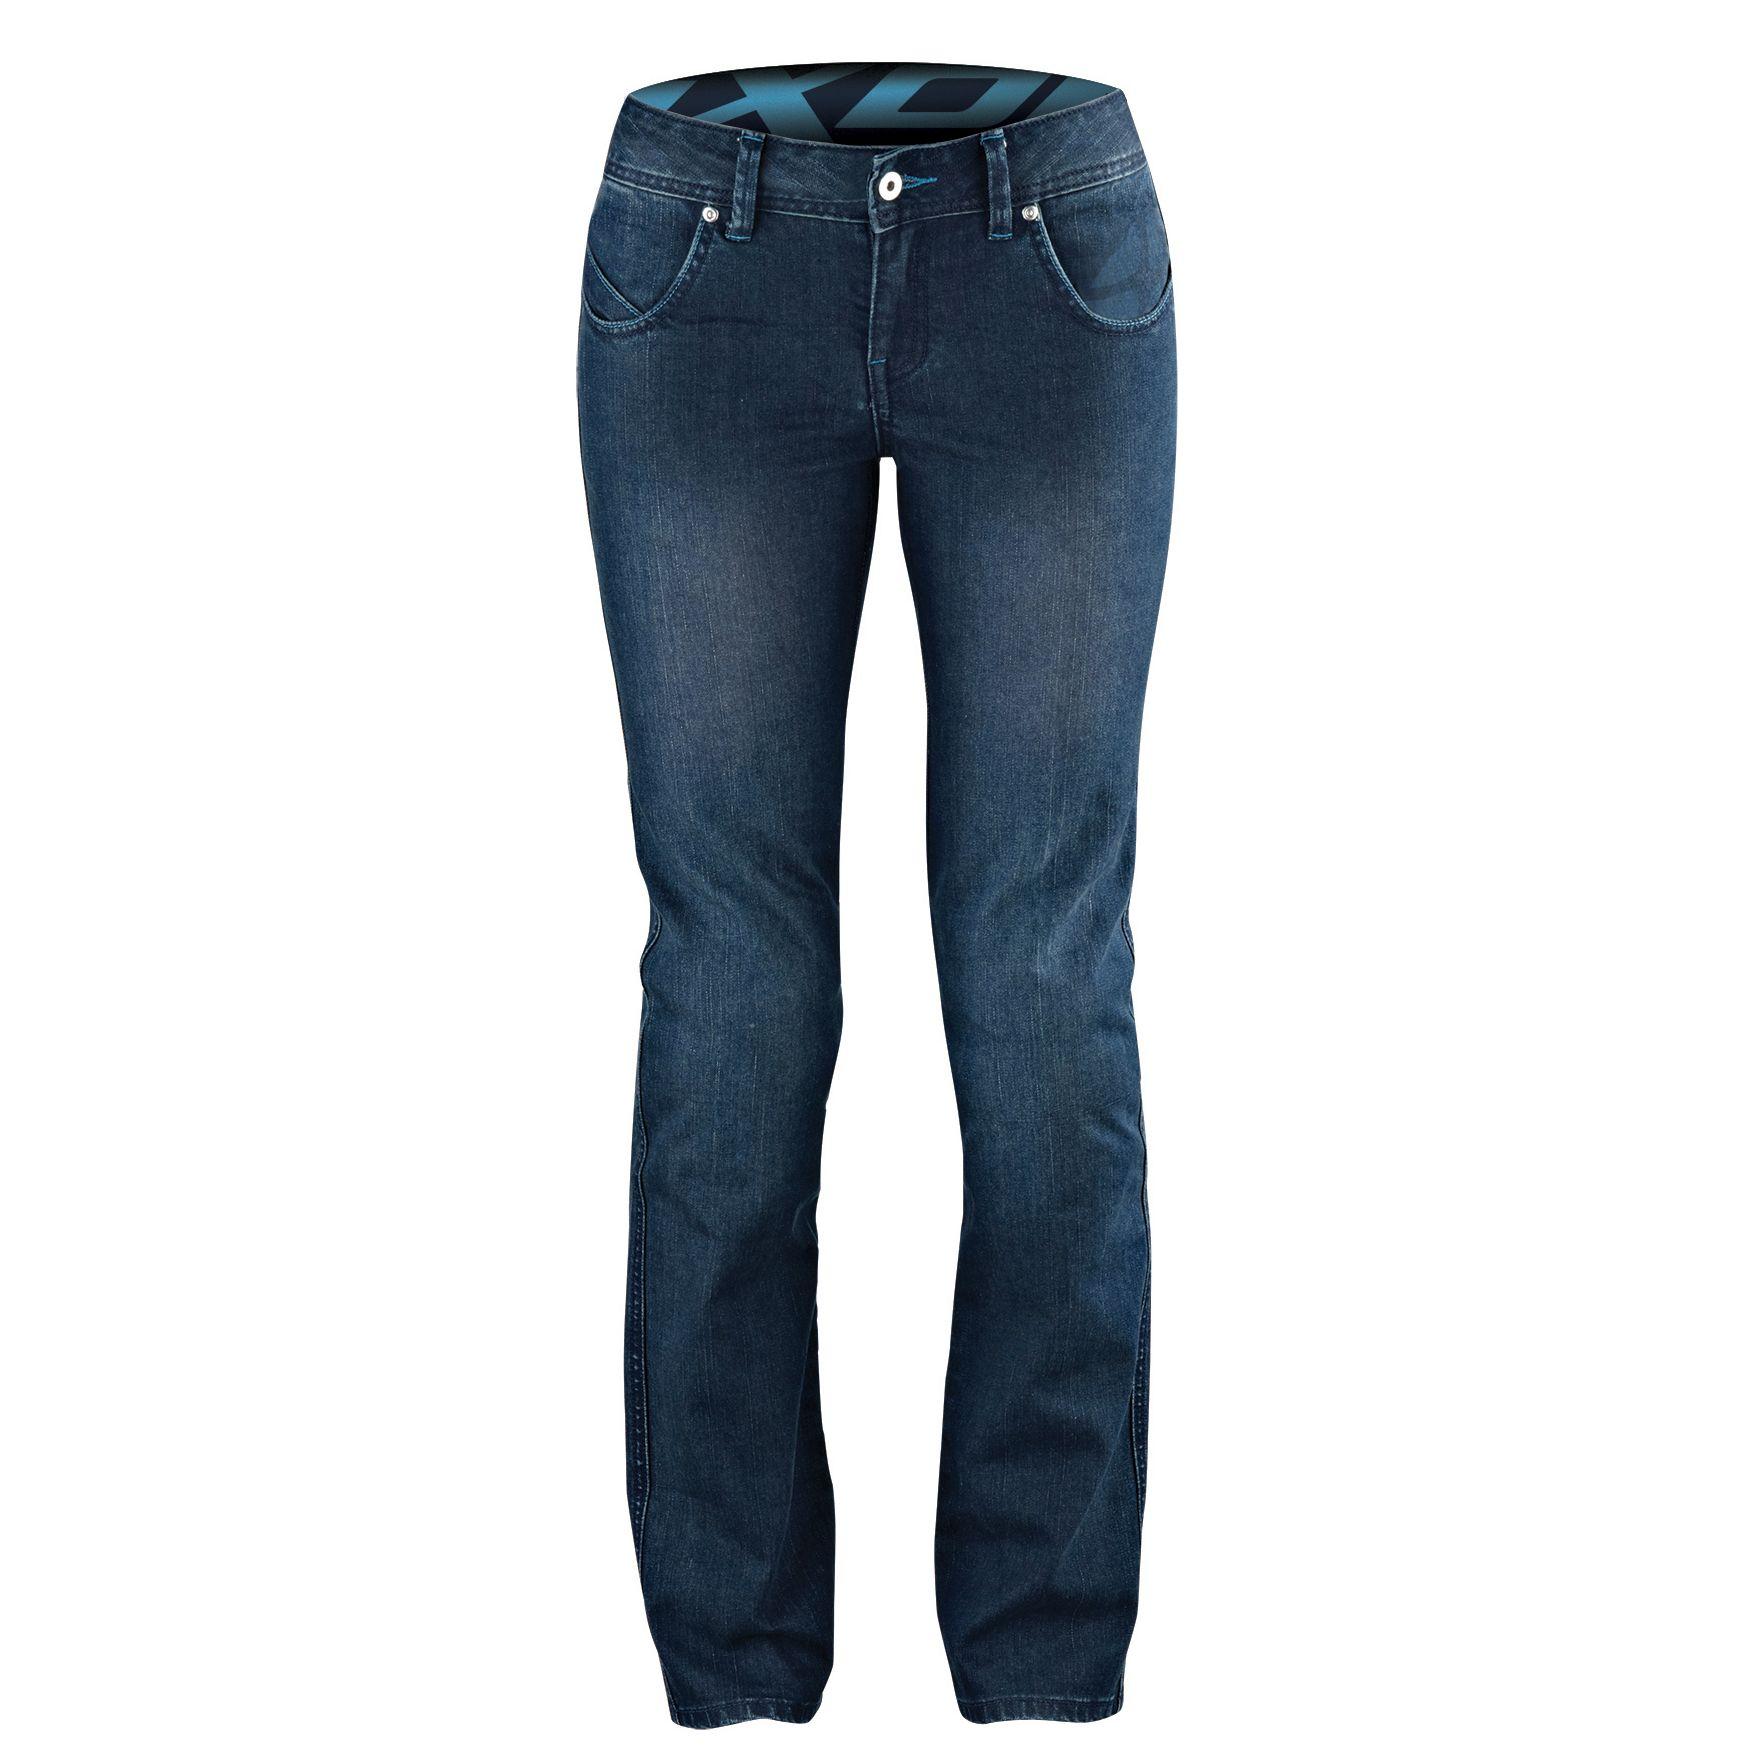 pantalon moto ixon britney bleu femme s team motos. Black Bedroom Furniture Sets. Home Design Ideas